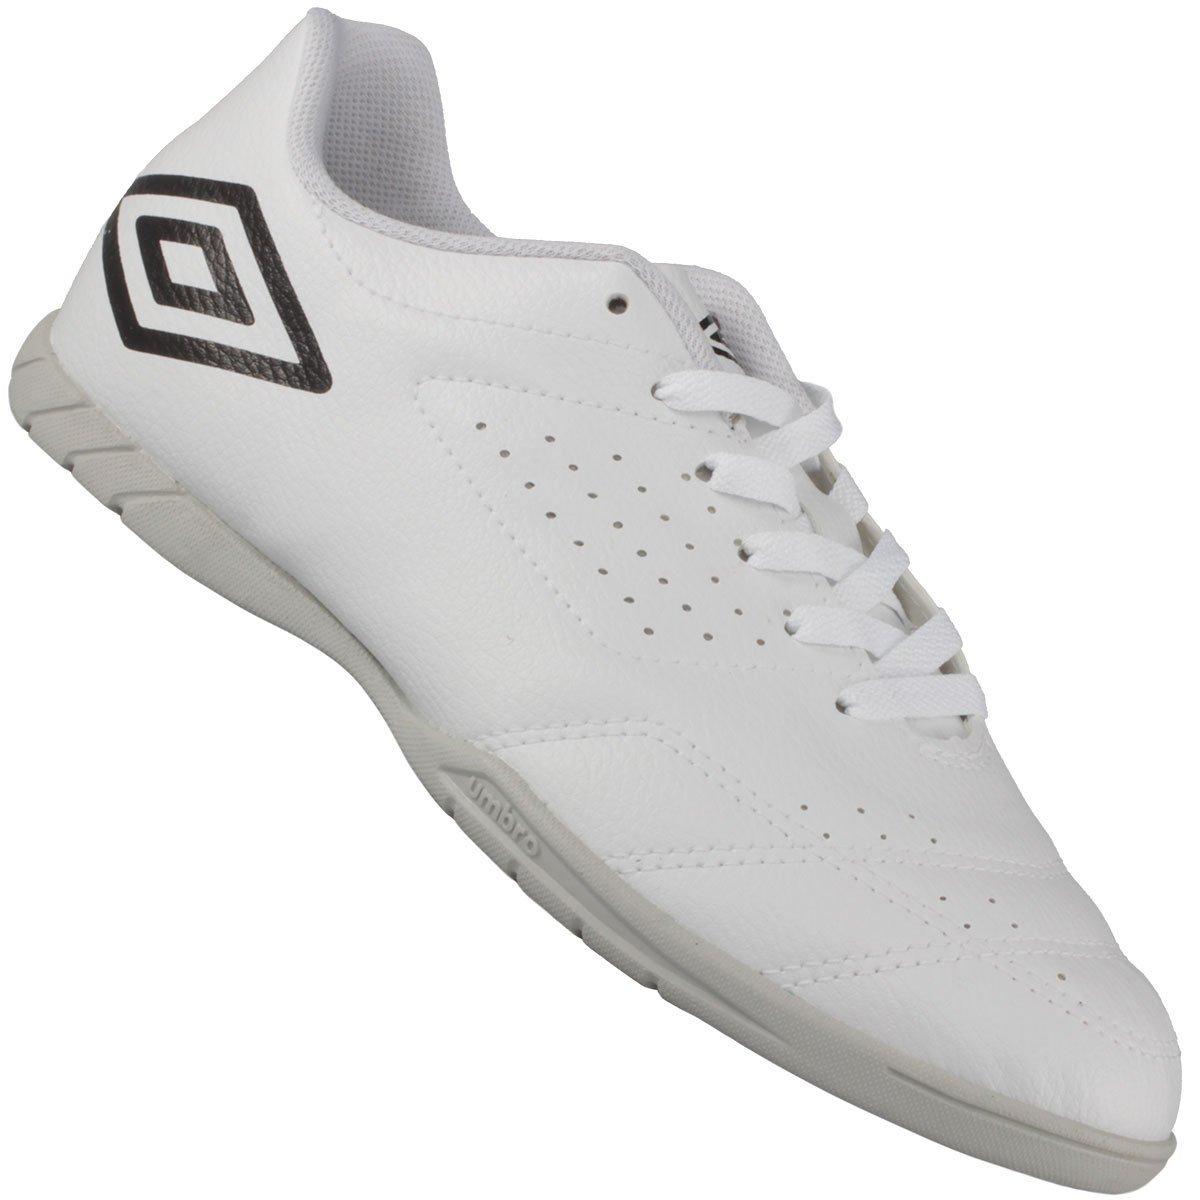 fb5dad0c3e29d Tênis Umbro Indoor Sala Futsal - Compre Agora